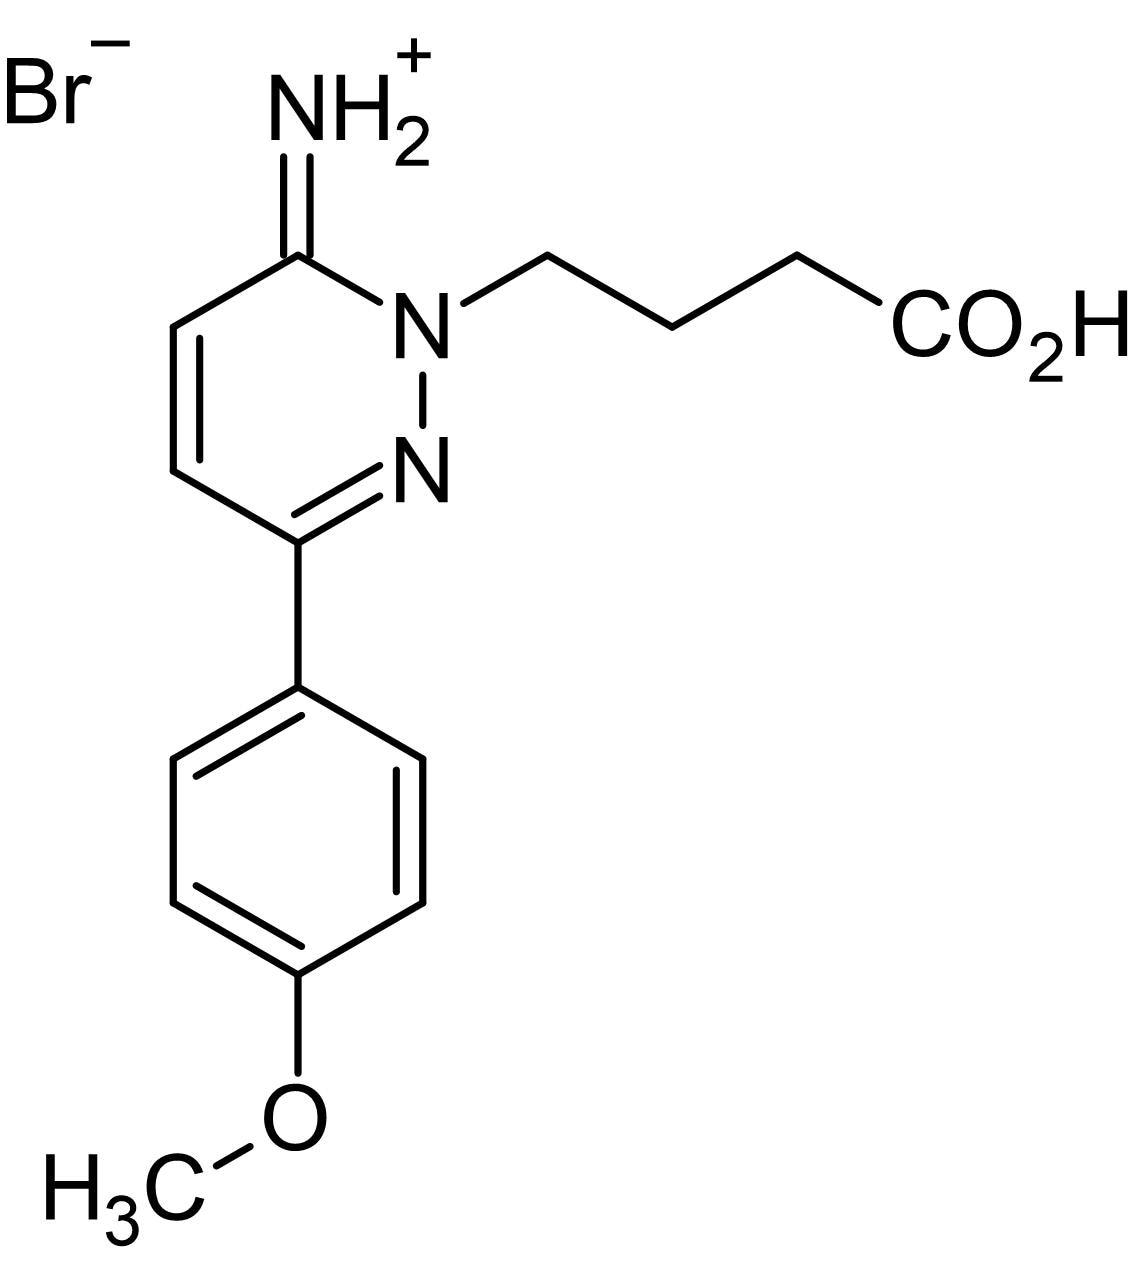 Chemical Structure - SR95531 (Gabazine) (mM/ml), GABA<sub>A</sub> antagonist (ab144487)